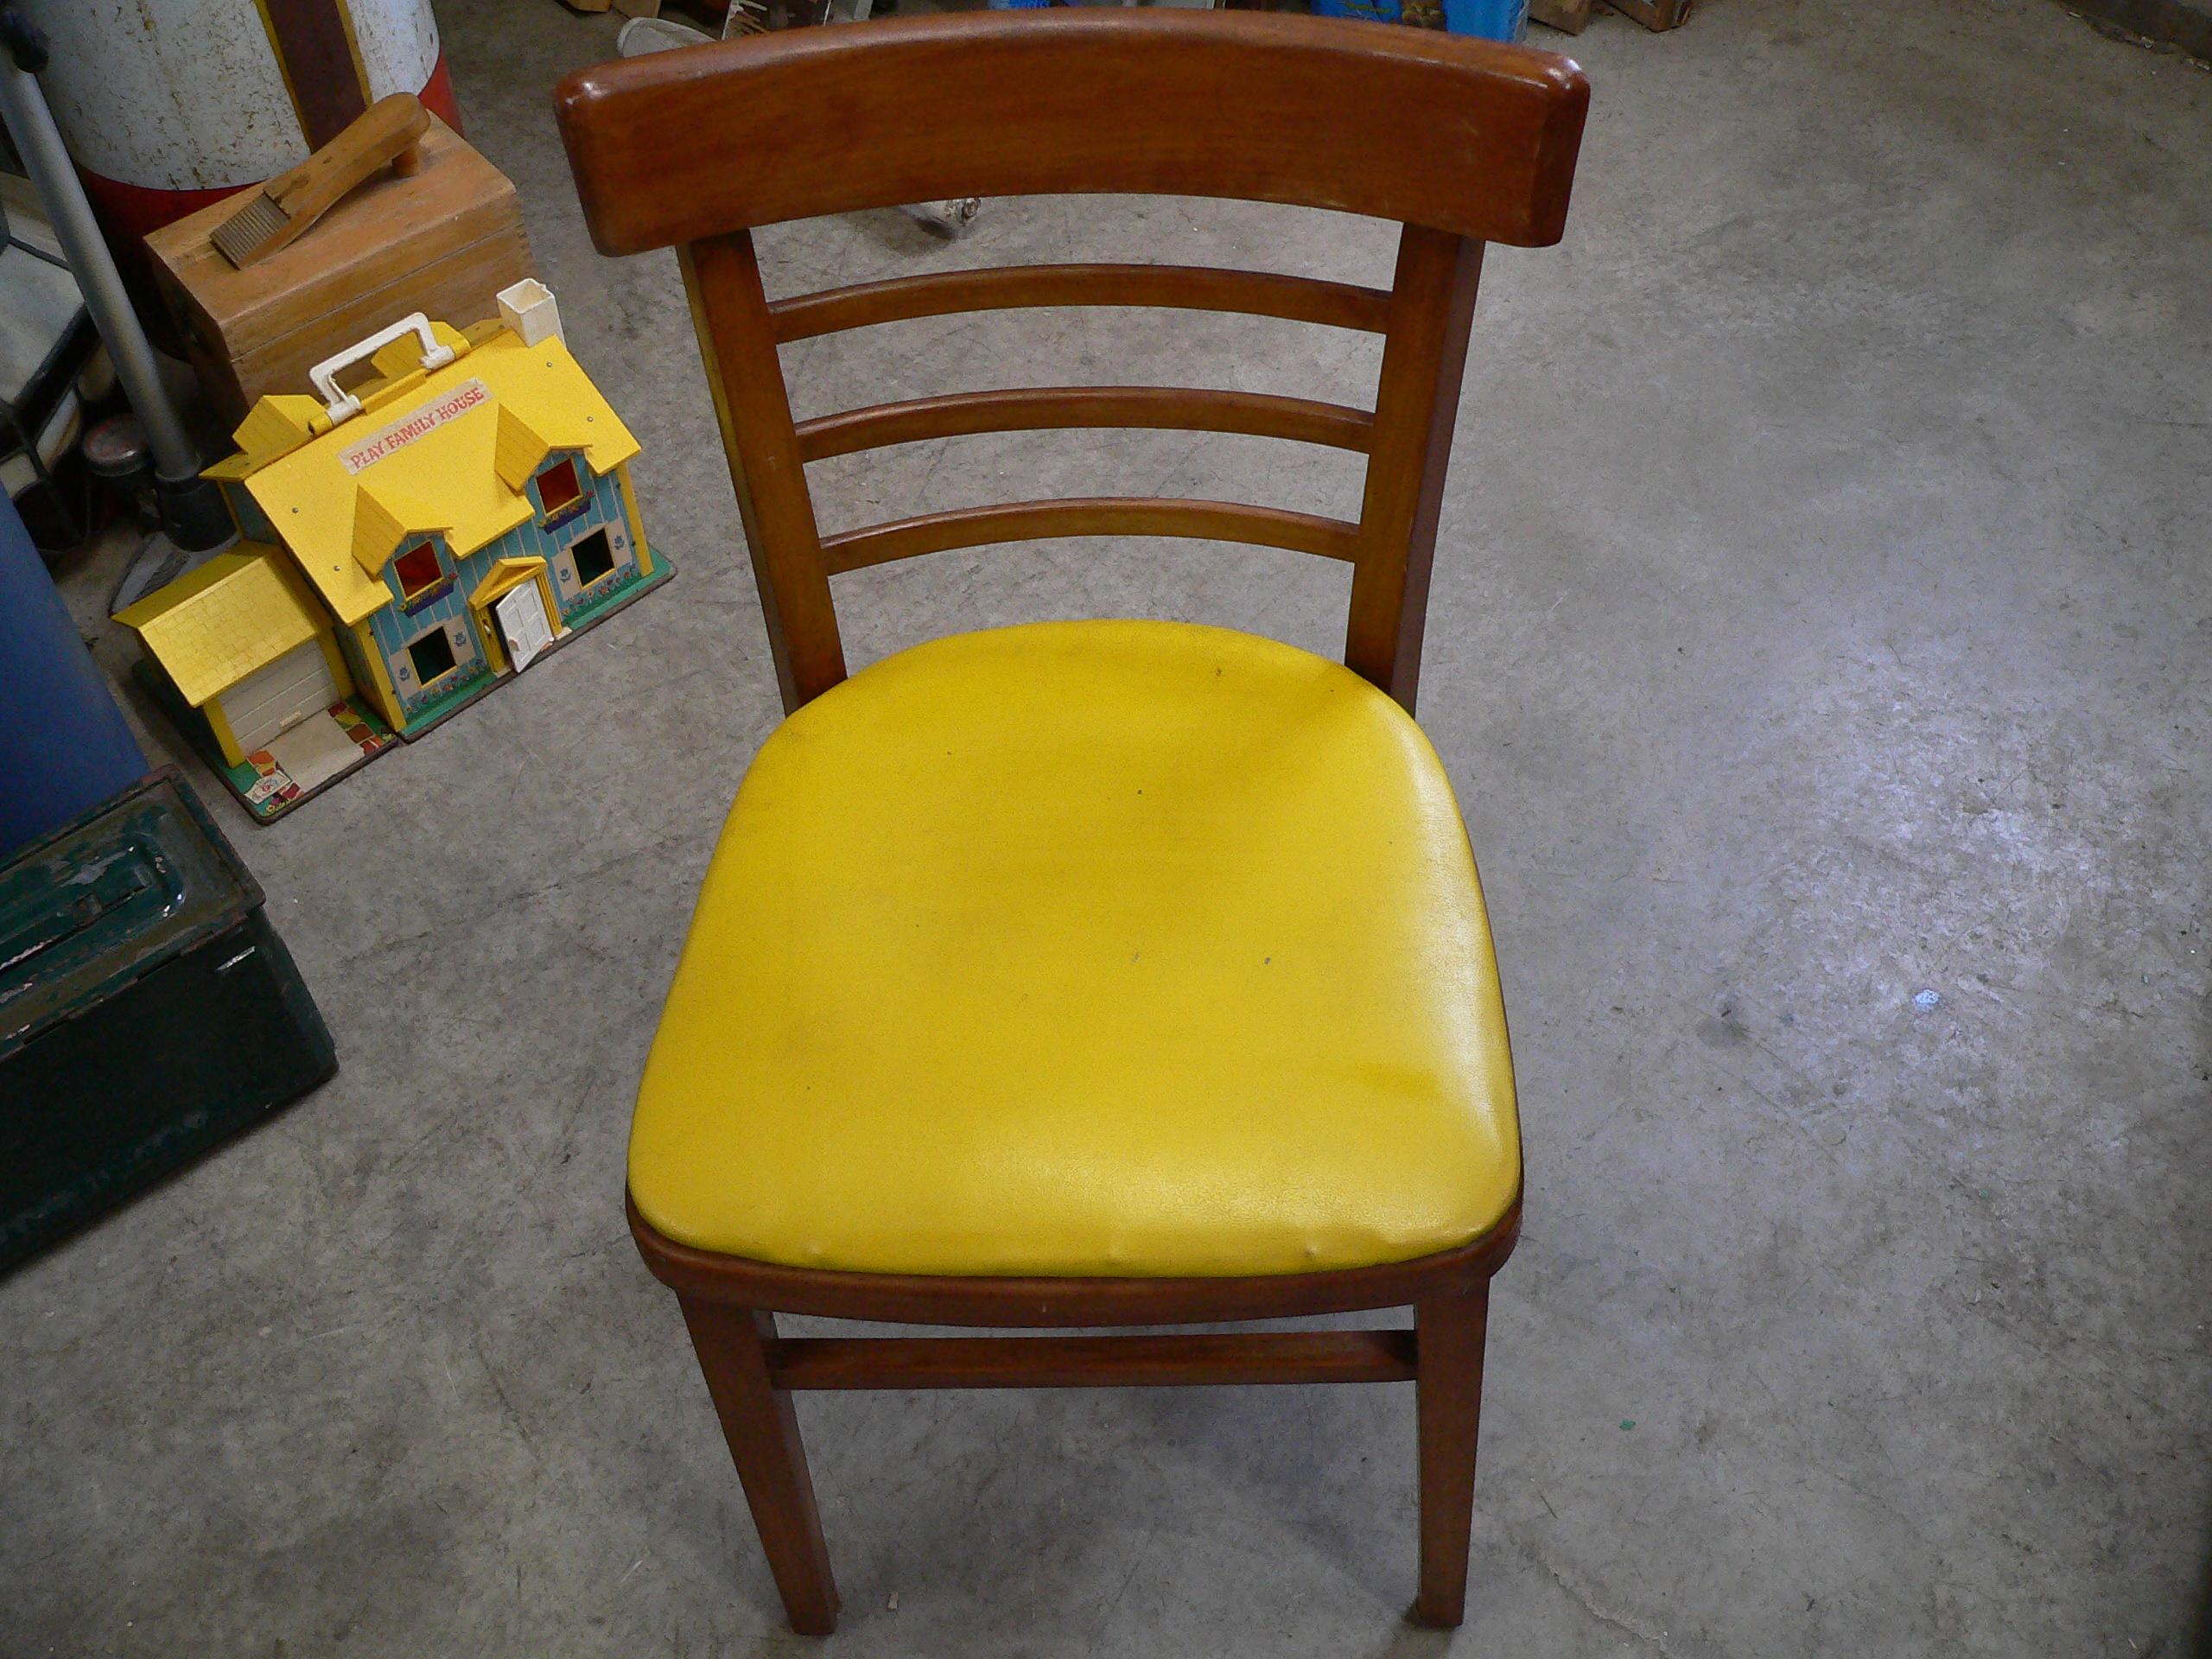 Chaise vintage # 5457.1